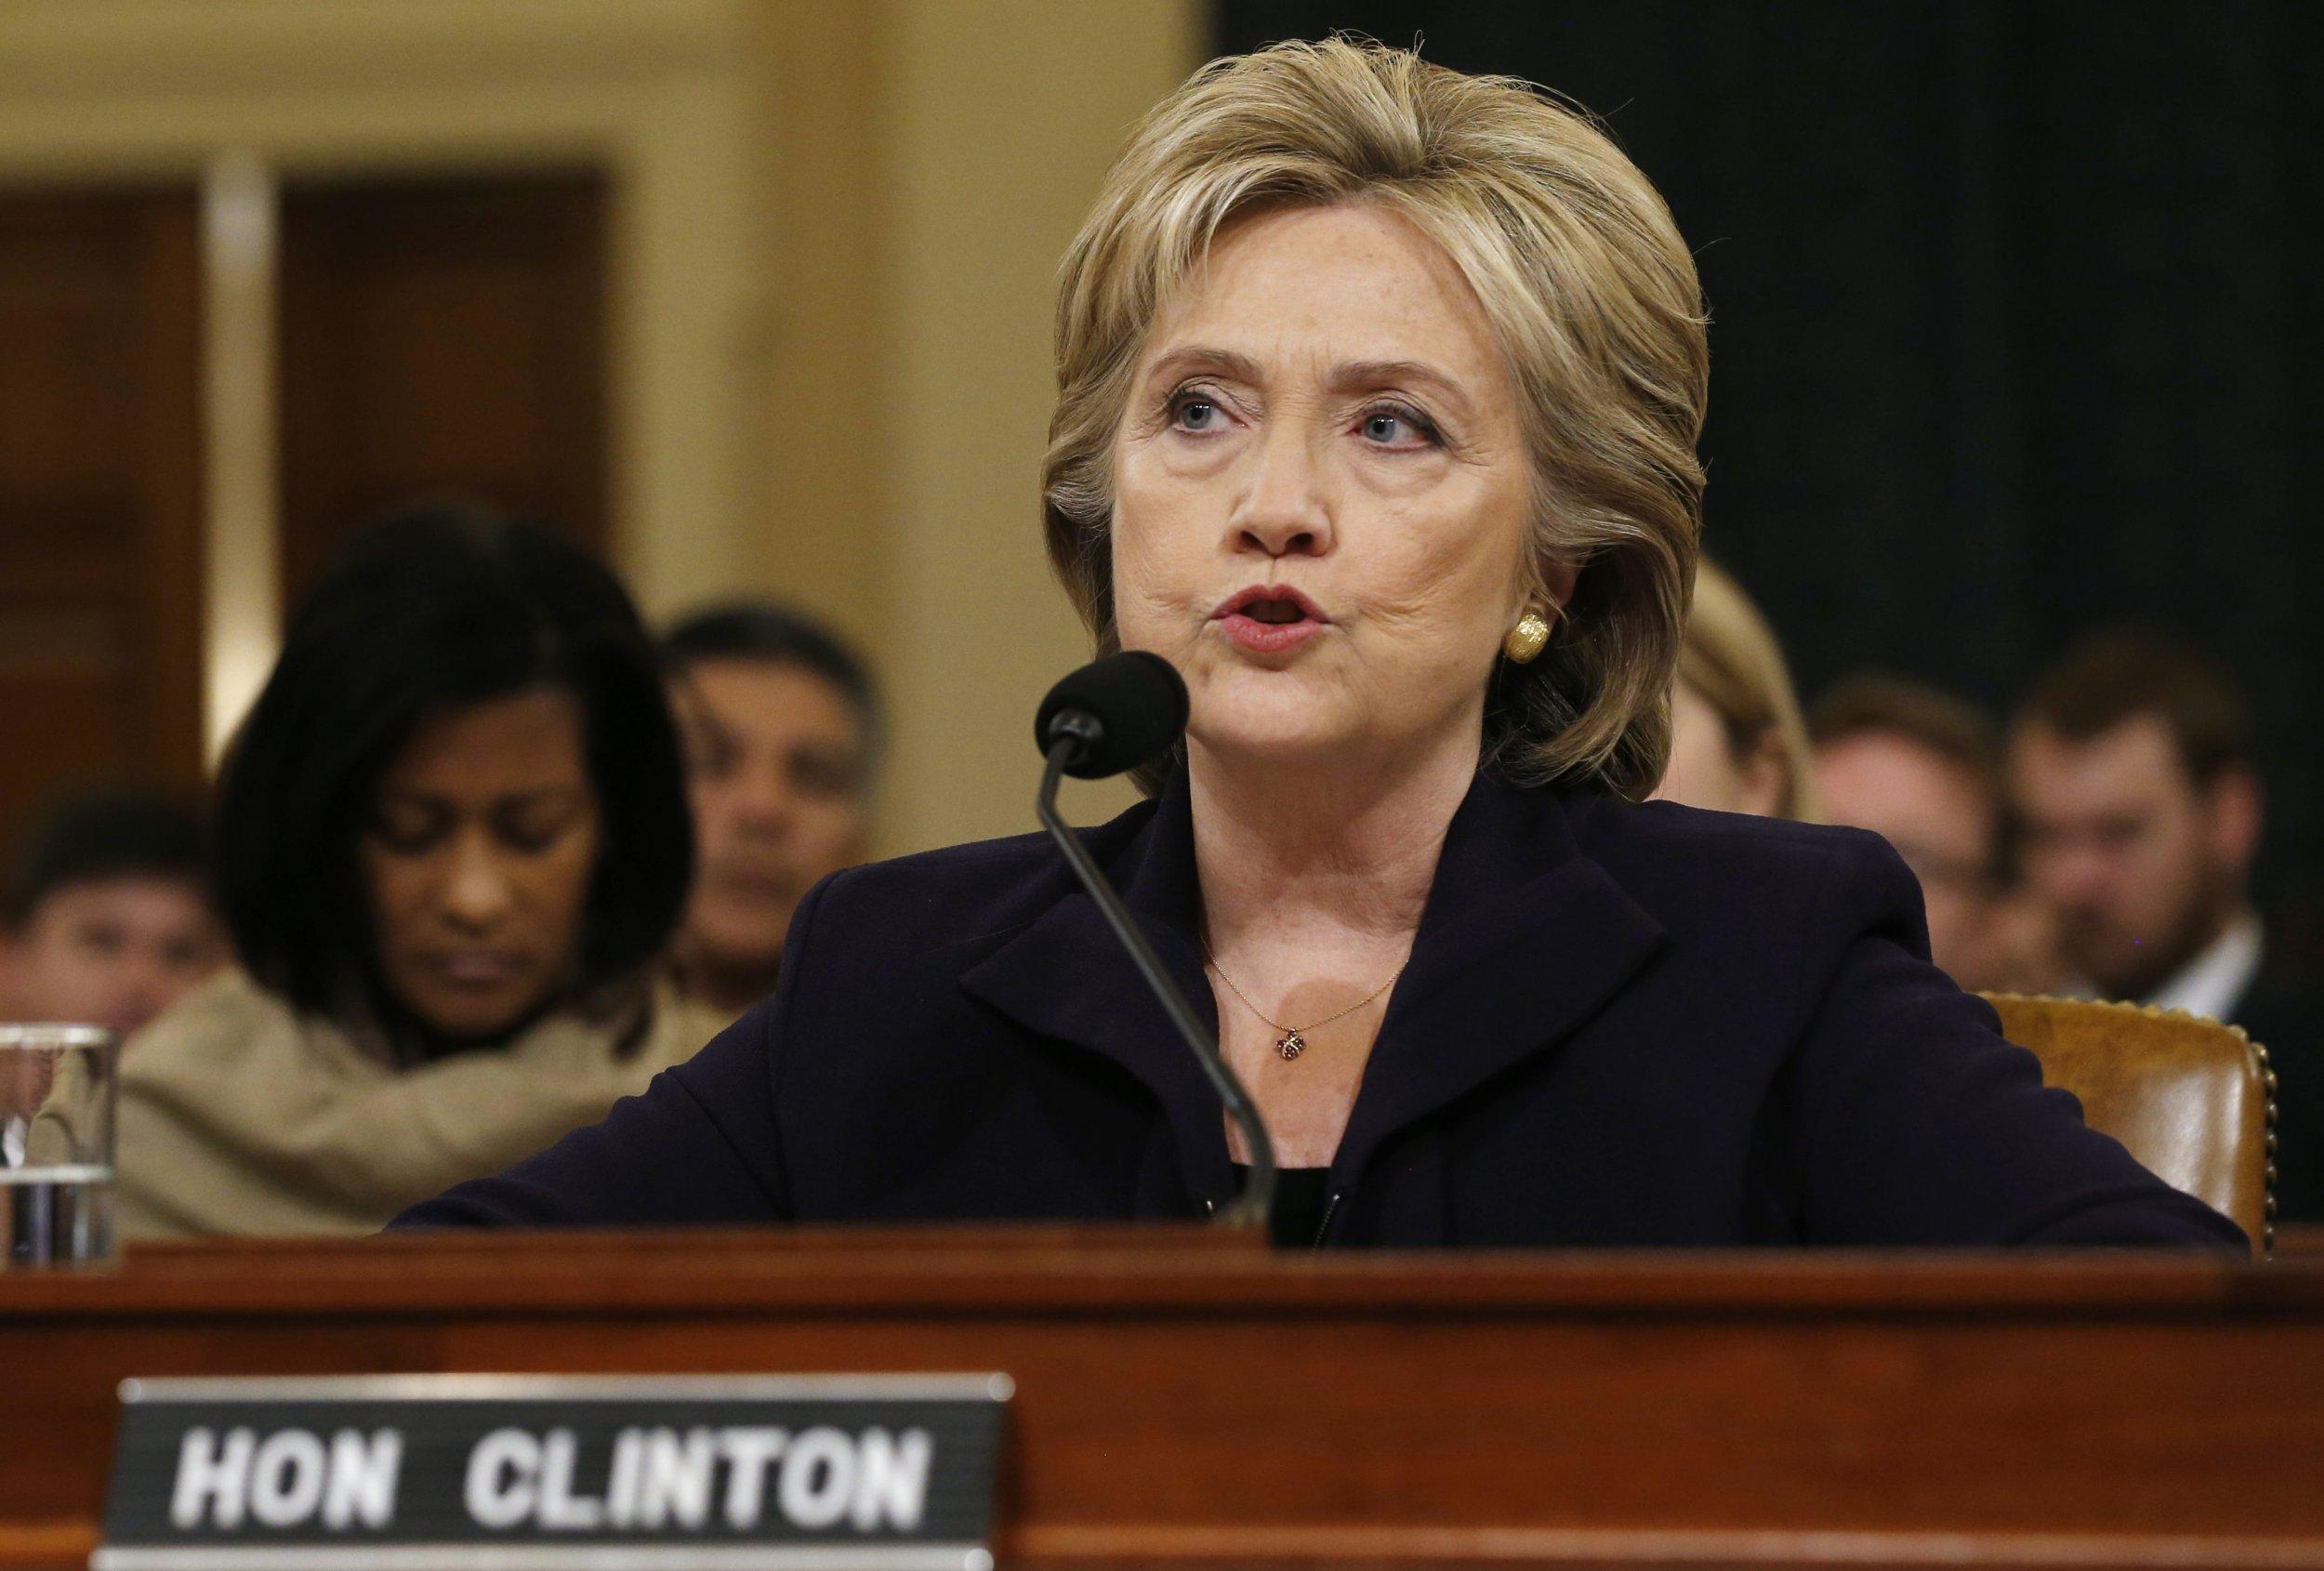 1021_Hillary_Clinton_Benghazi_hearing_03